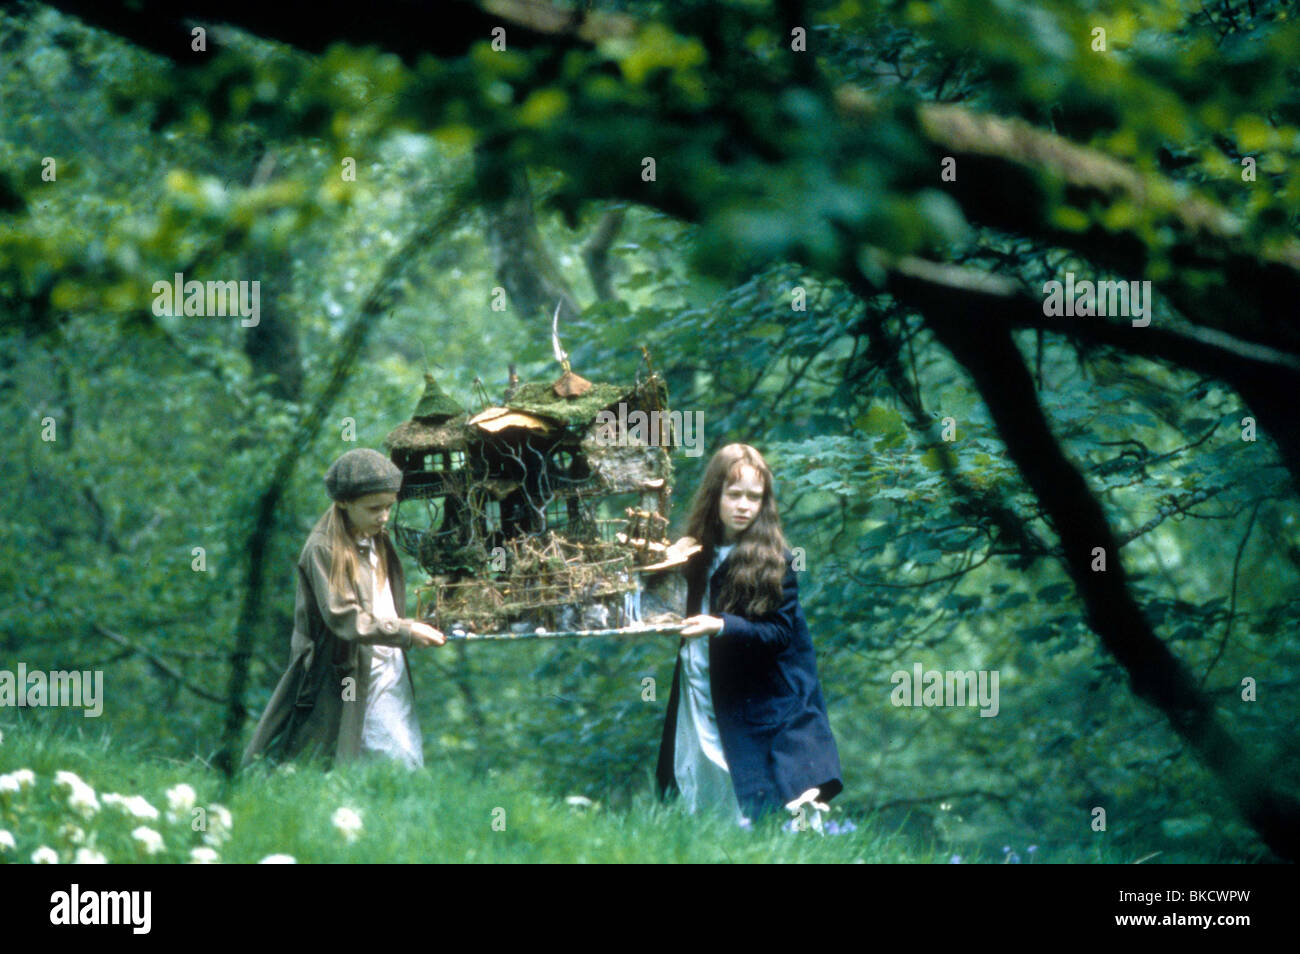 FAIRYTALE - A TRUE STORY (1998) ELIZABETH EARL, FLORENCE HOATH FATS 044 - Stock Image